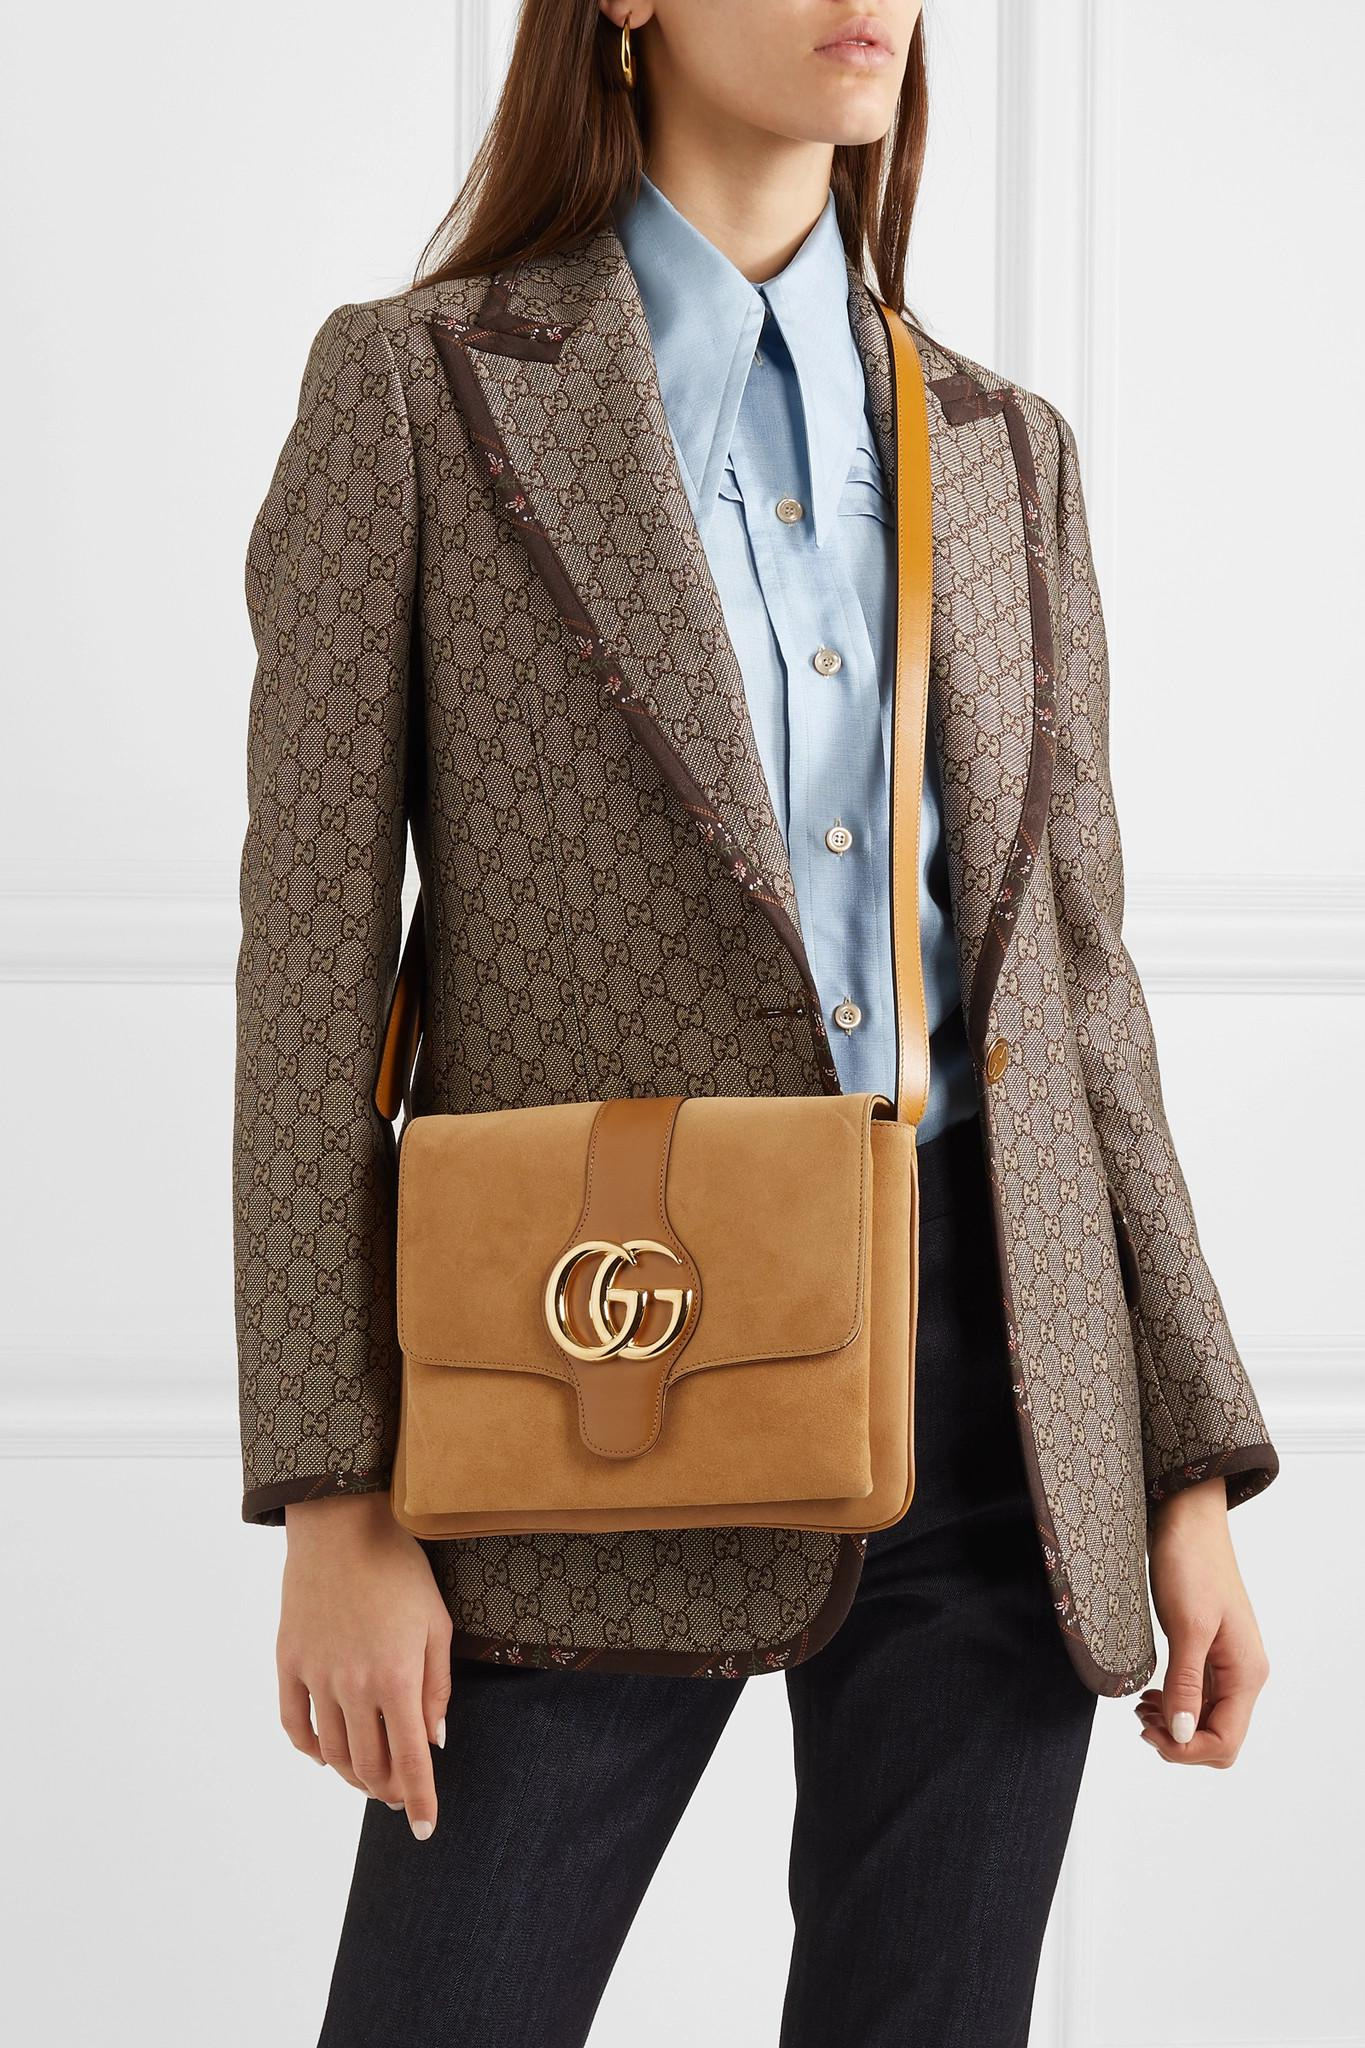 daaca79d154 Gucci - Brown Arli Medium Leather-trimmed Suede Shoulder Bag - Lyst. View  fullscreen